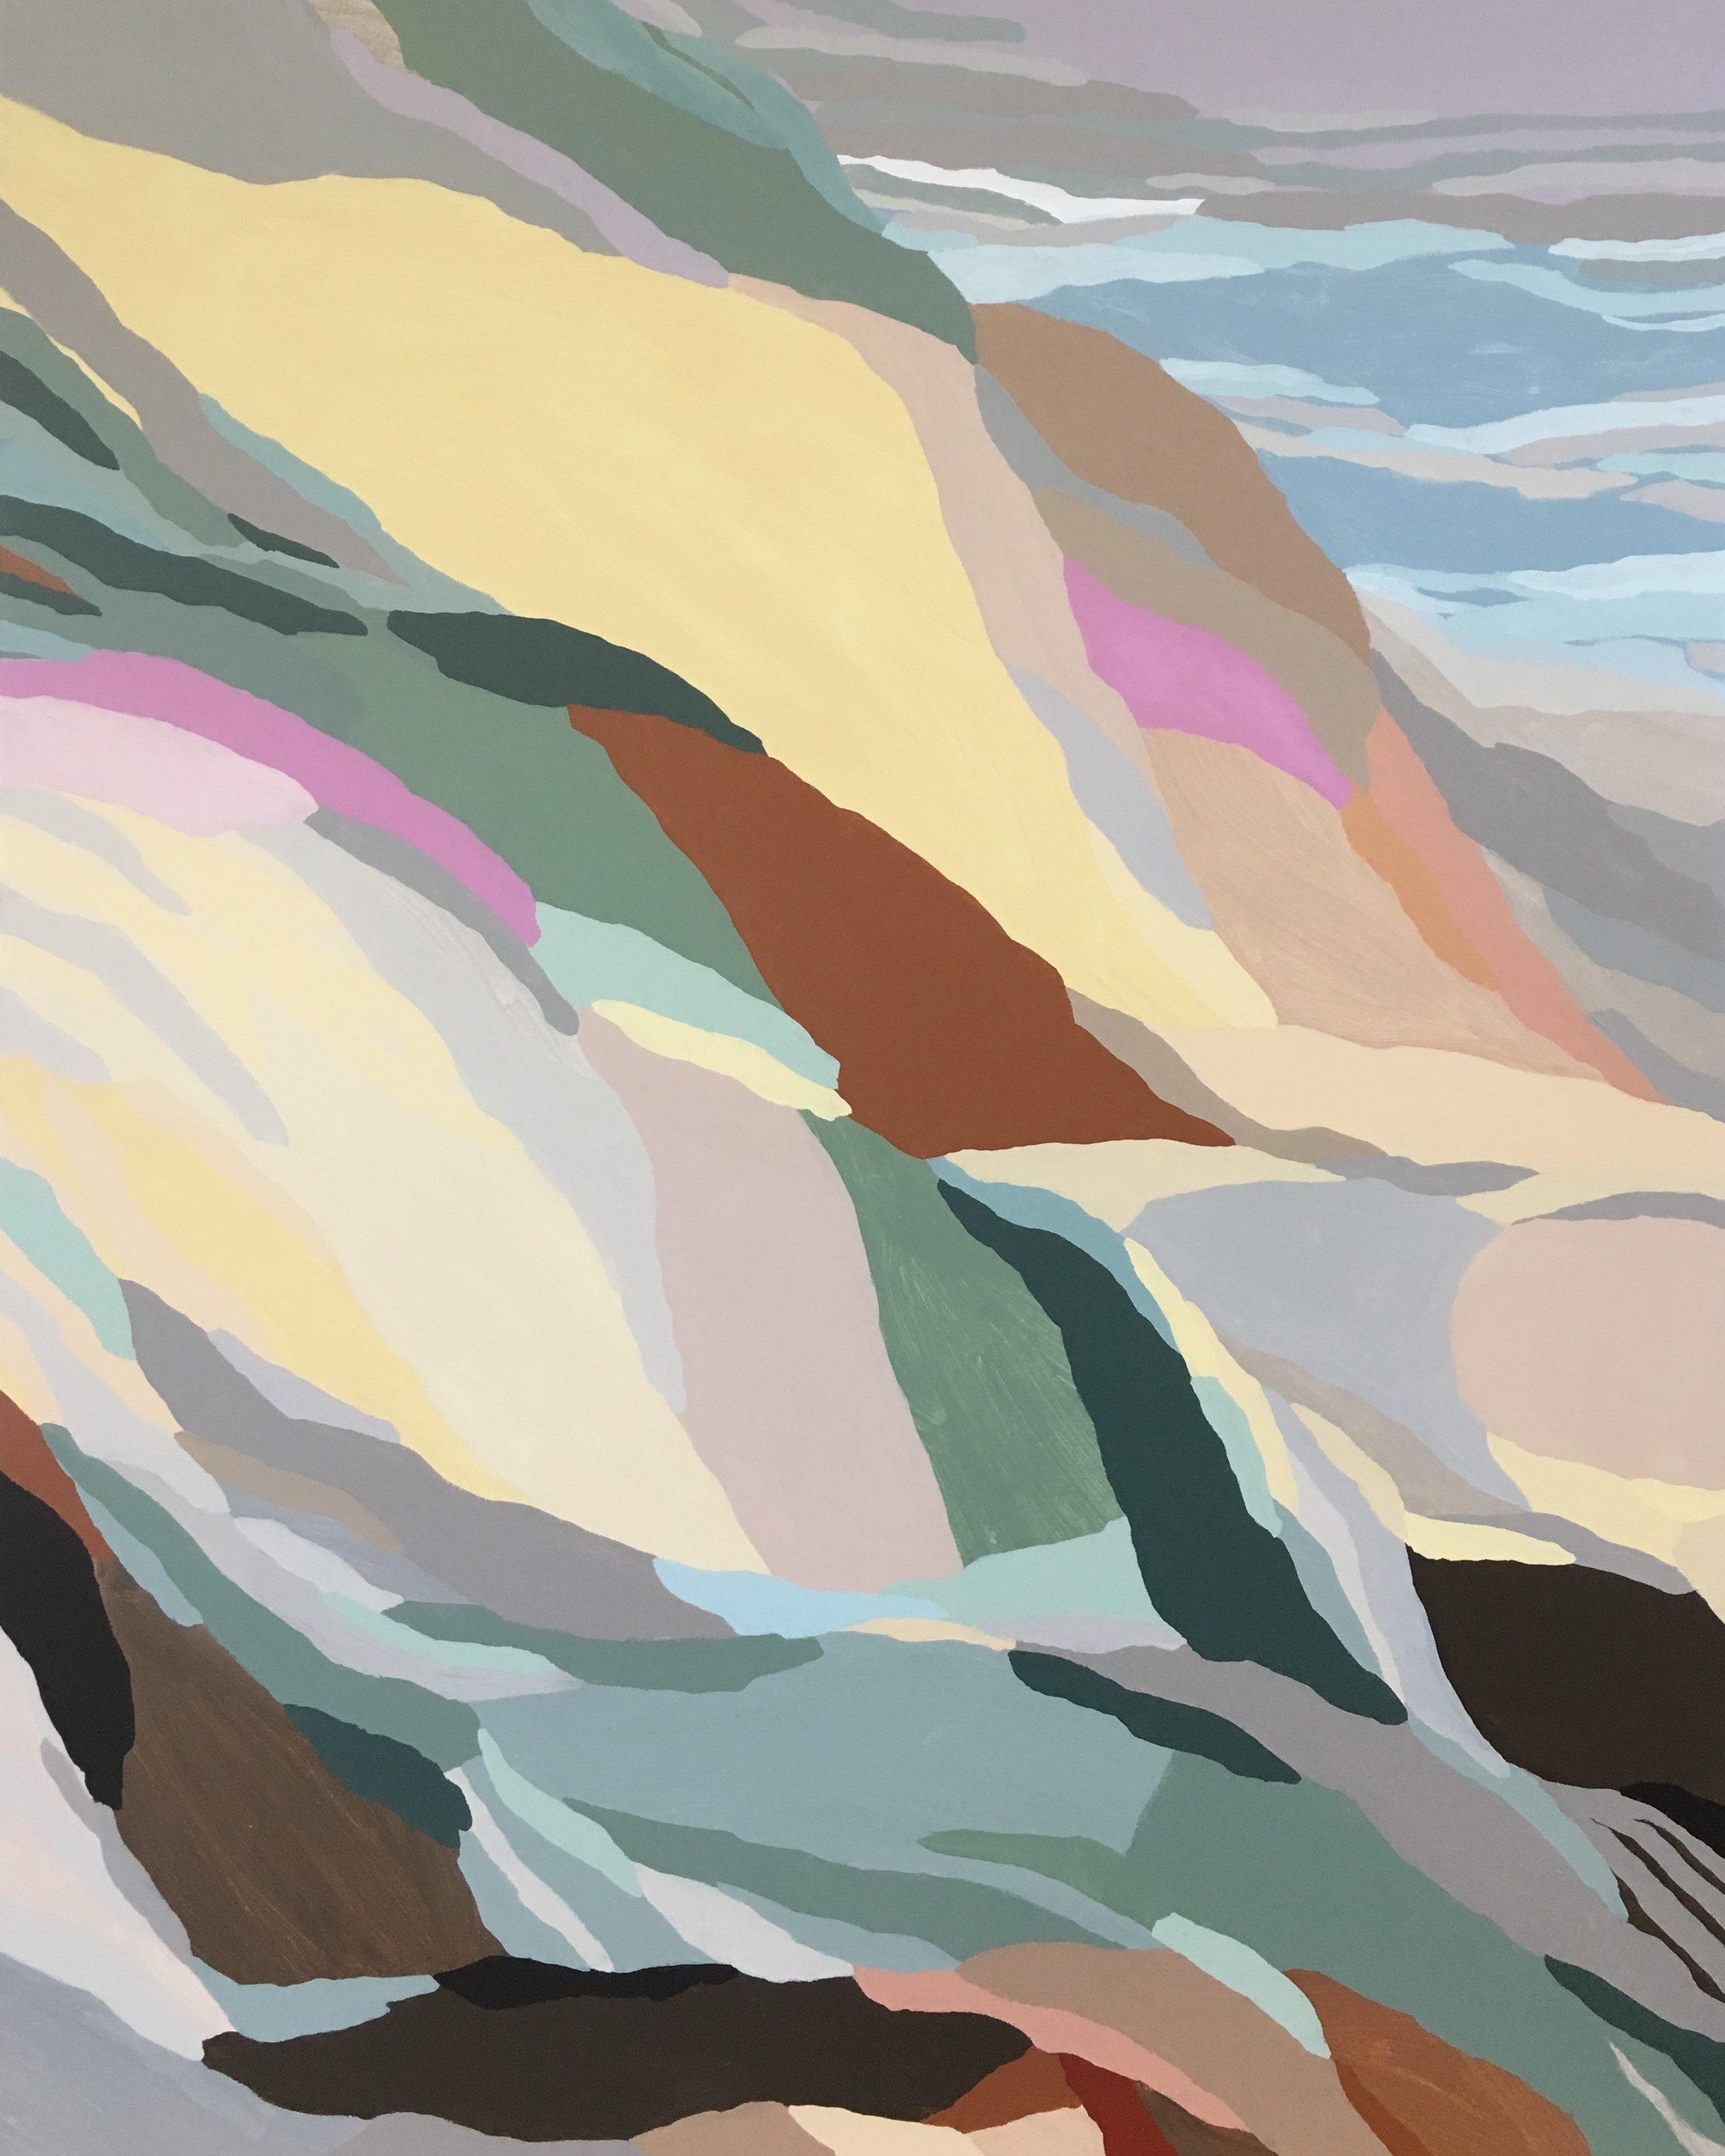 Cliffside Walk, acrylic on canvas, 2018